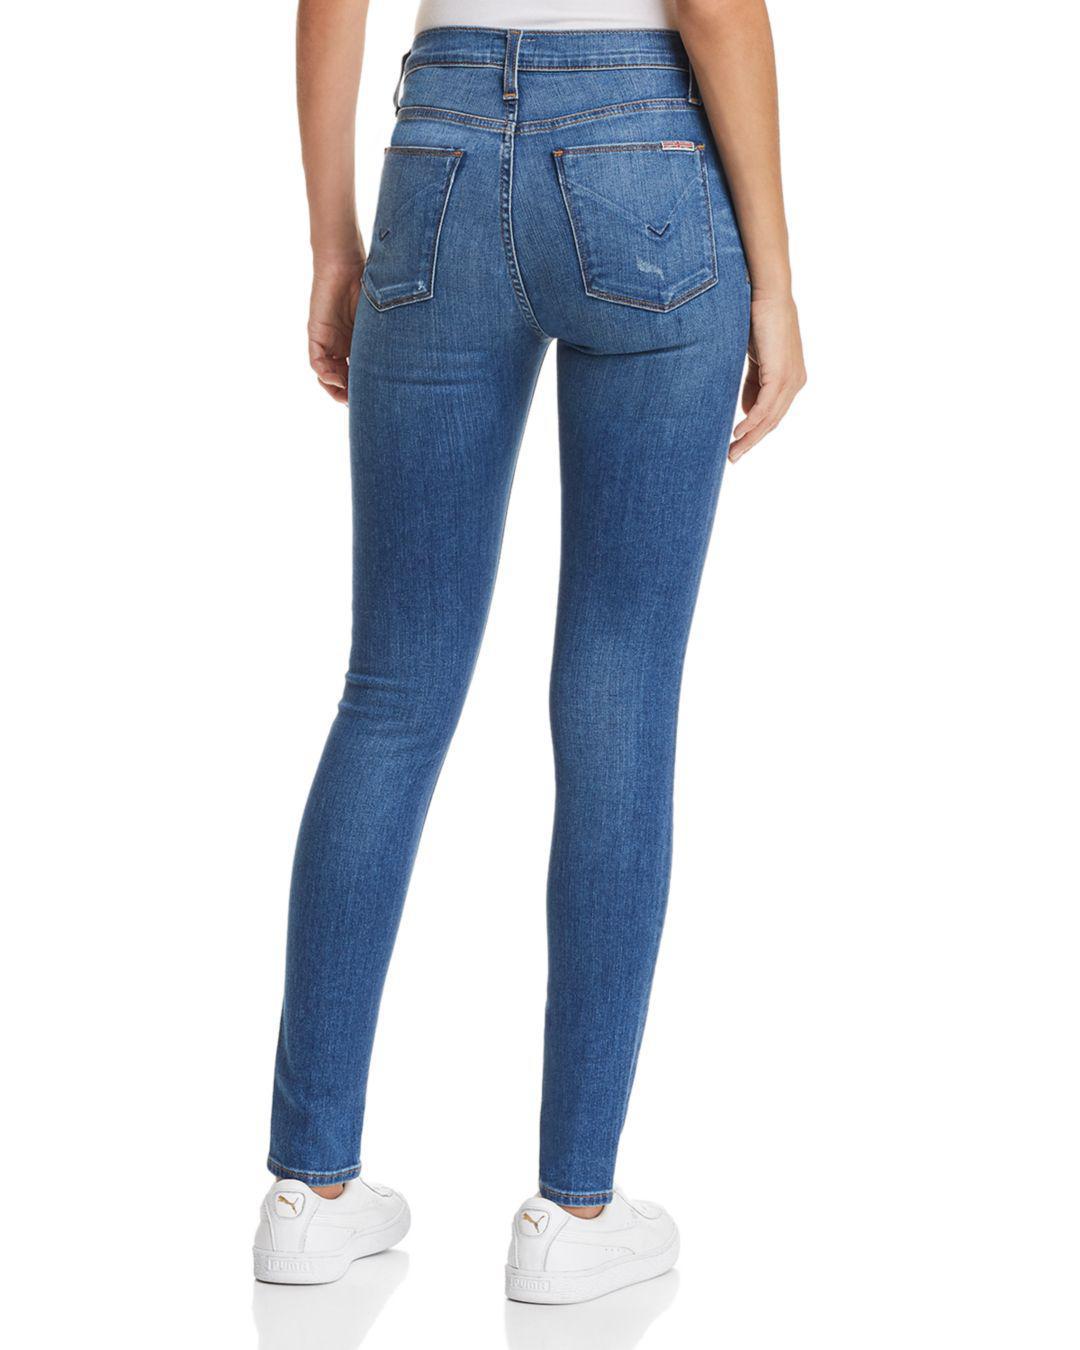 047151a6335 Hudson Jeans Barbara High Rise Super Skinny Jeans In Ultralight ...